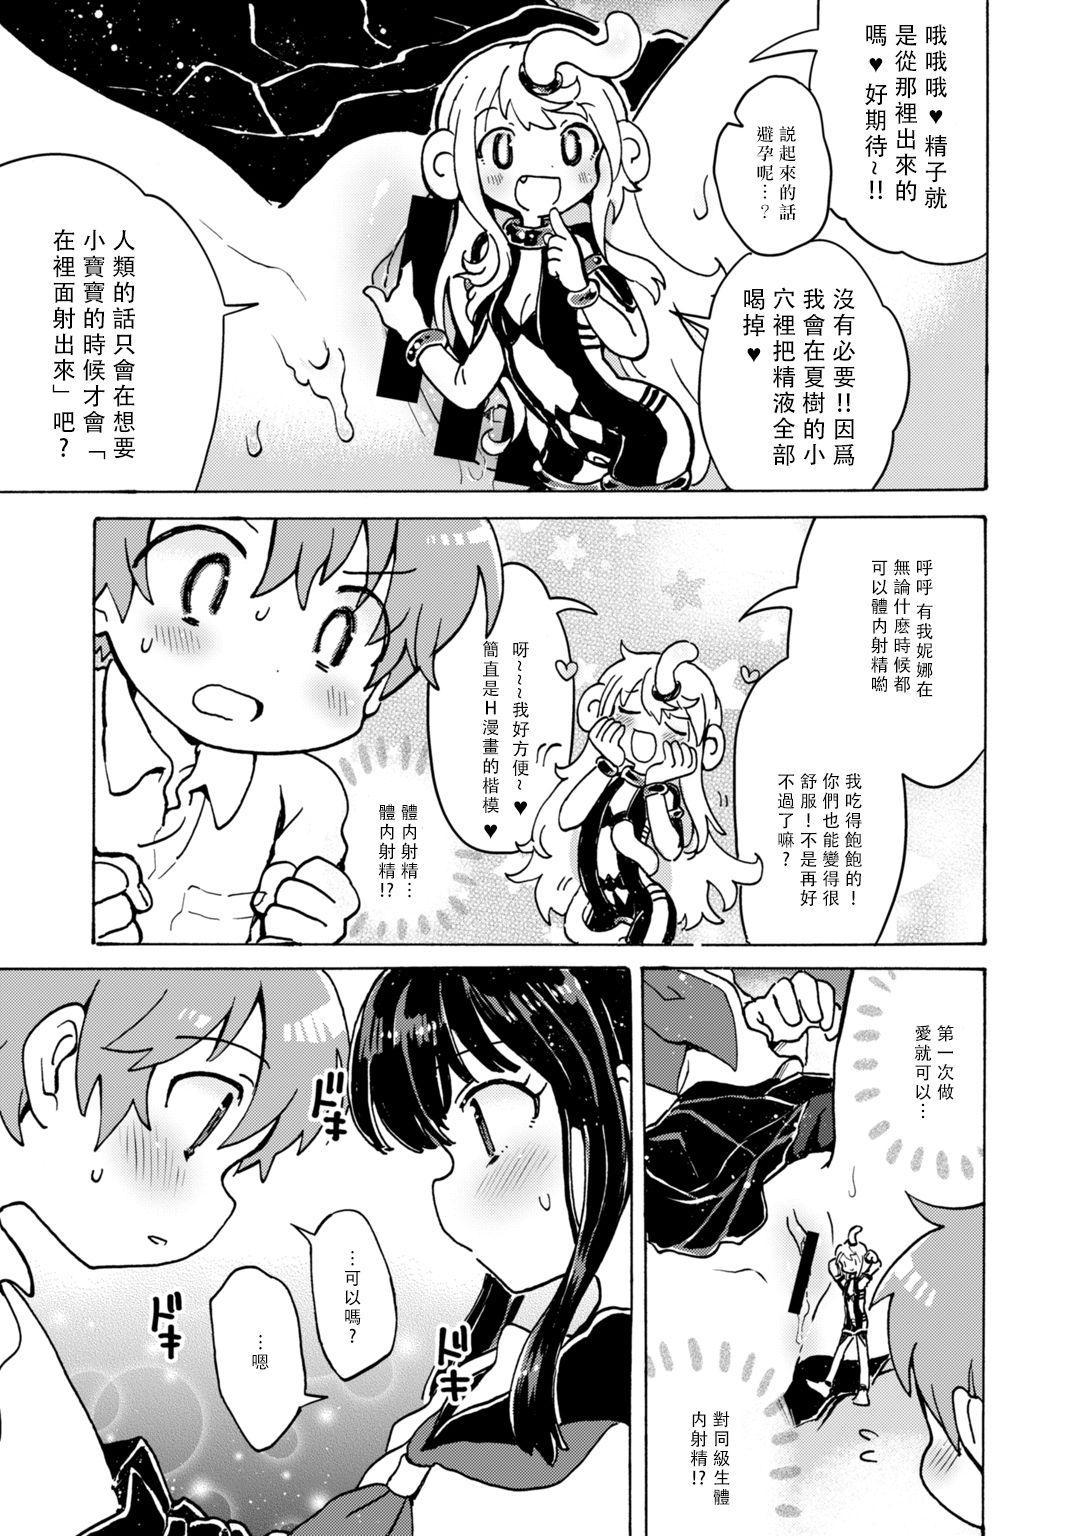 Chitsu no Naka kara Konnichiwa!! - Hello from the hole of love! 9